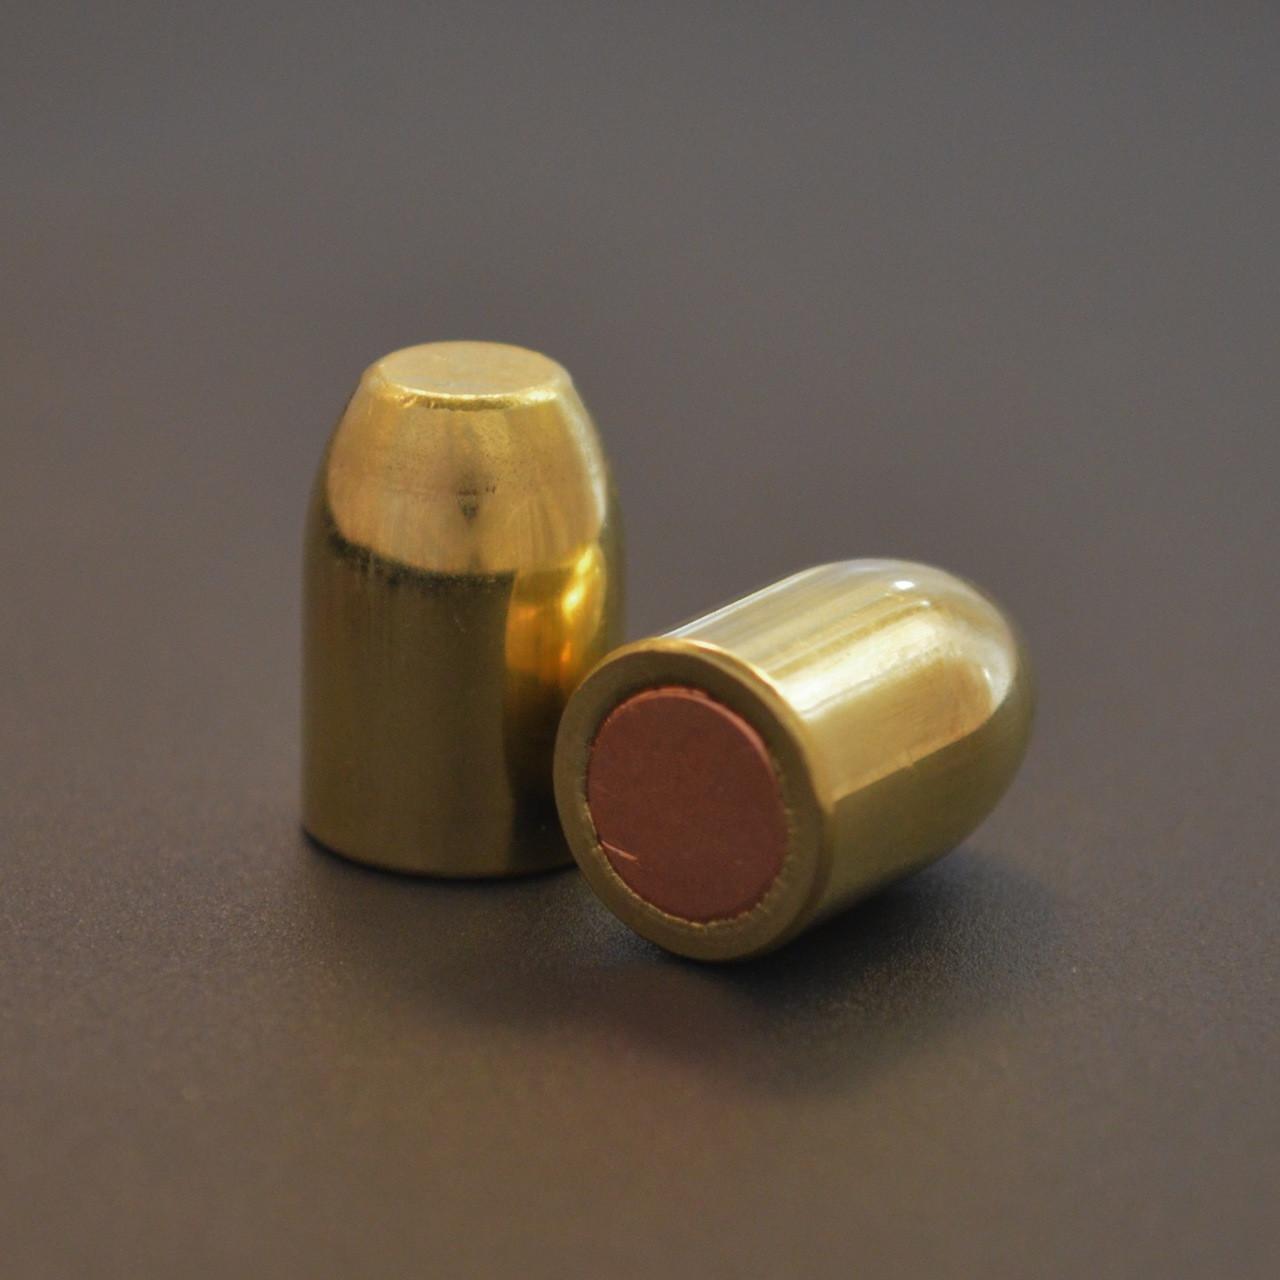 10mm/.40 180gr CMJ - 100ct